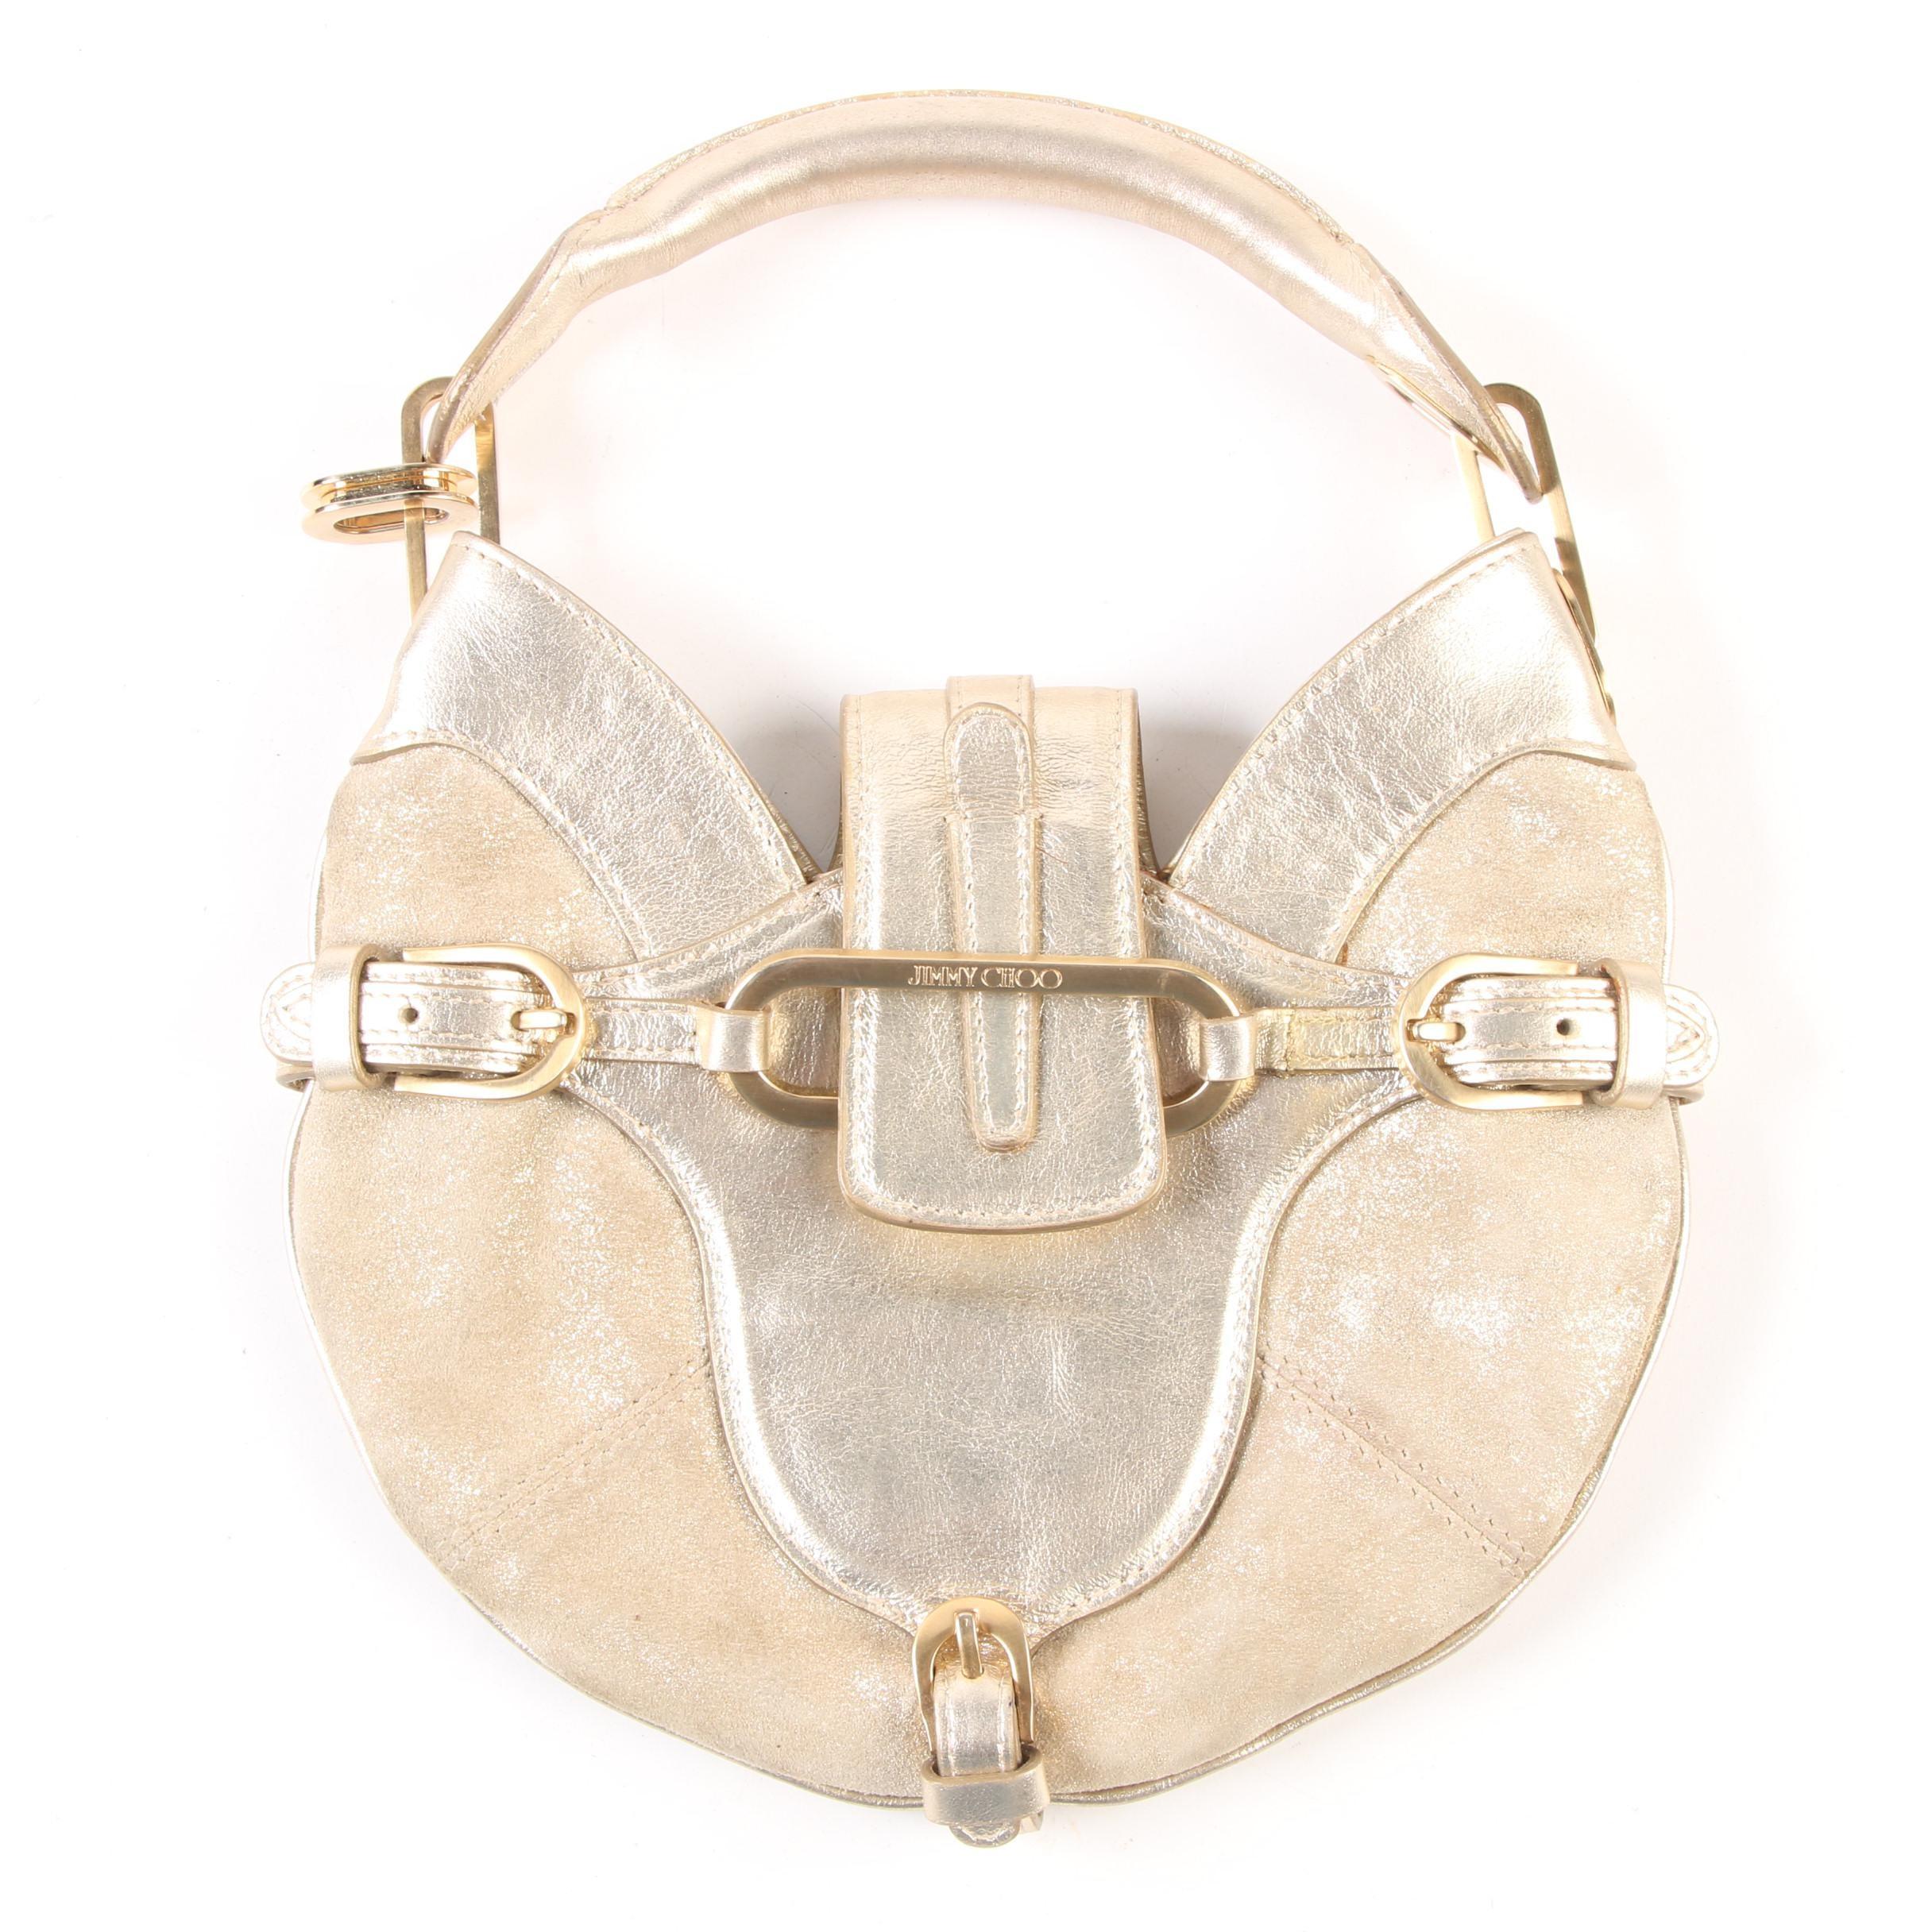 Jimmy Choo Mini Tulita Hobo Bag in Metallic Gold Leather and Suede